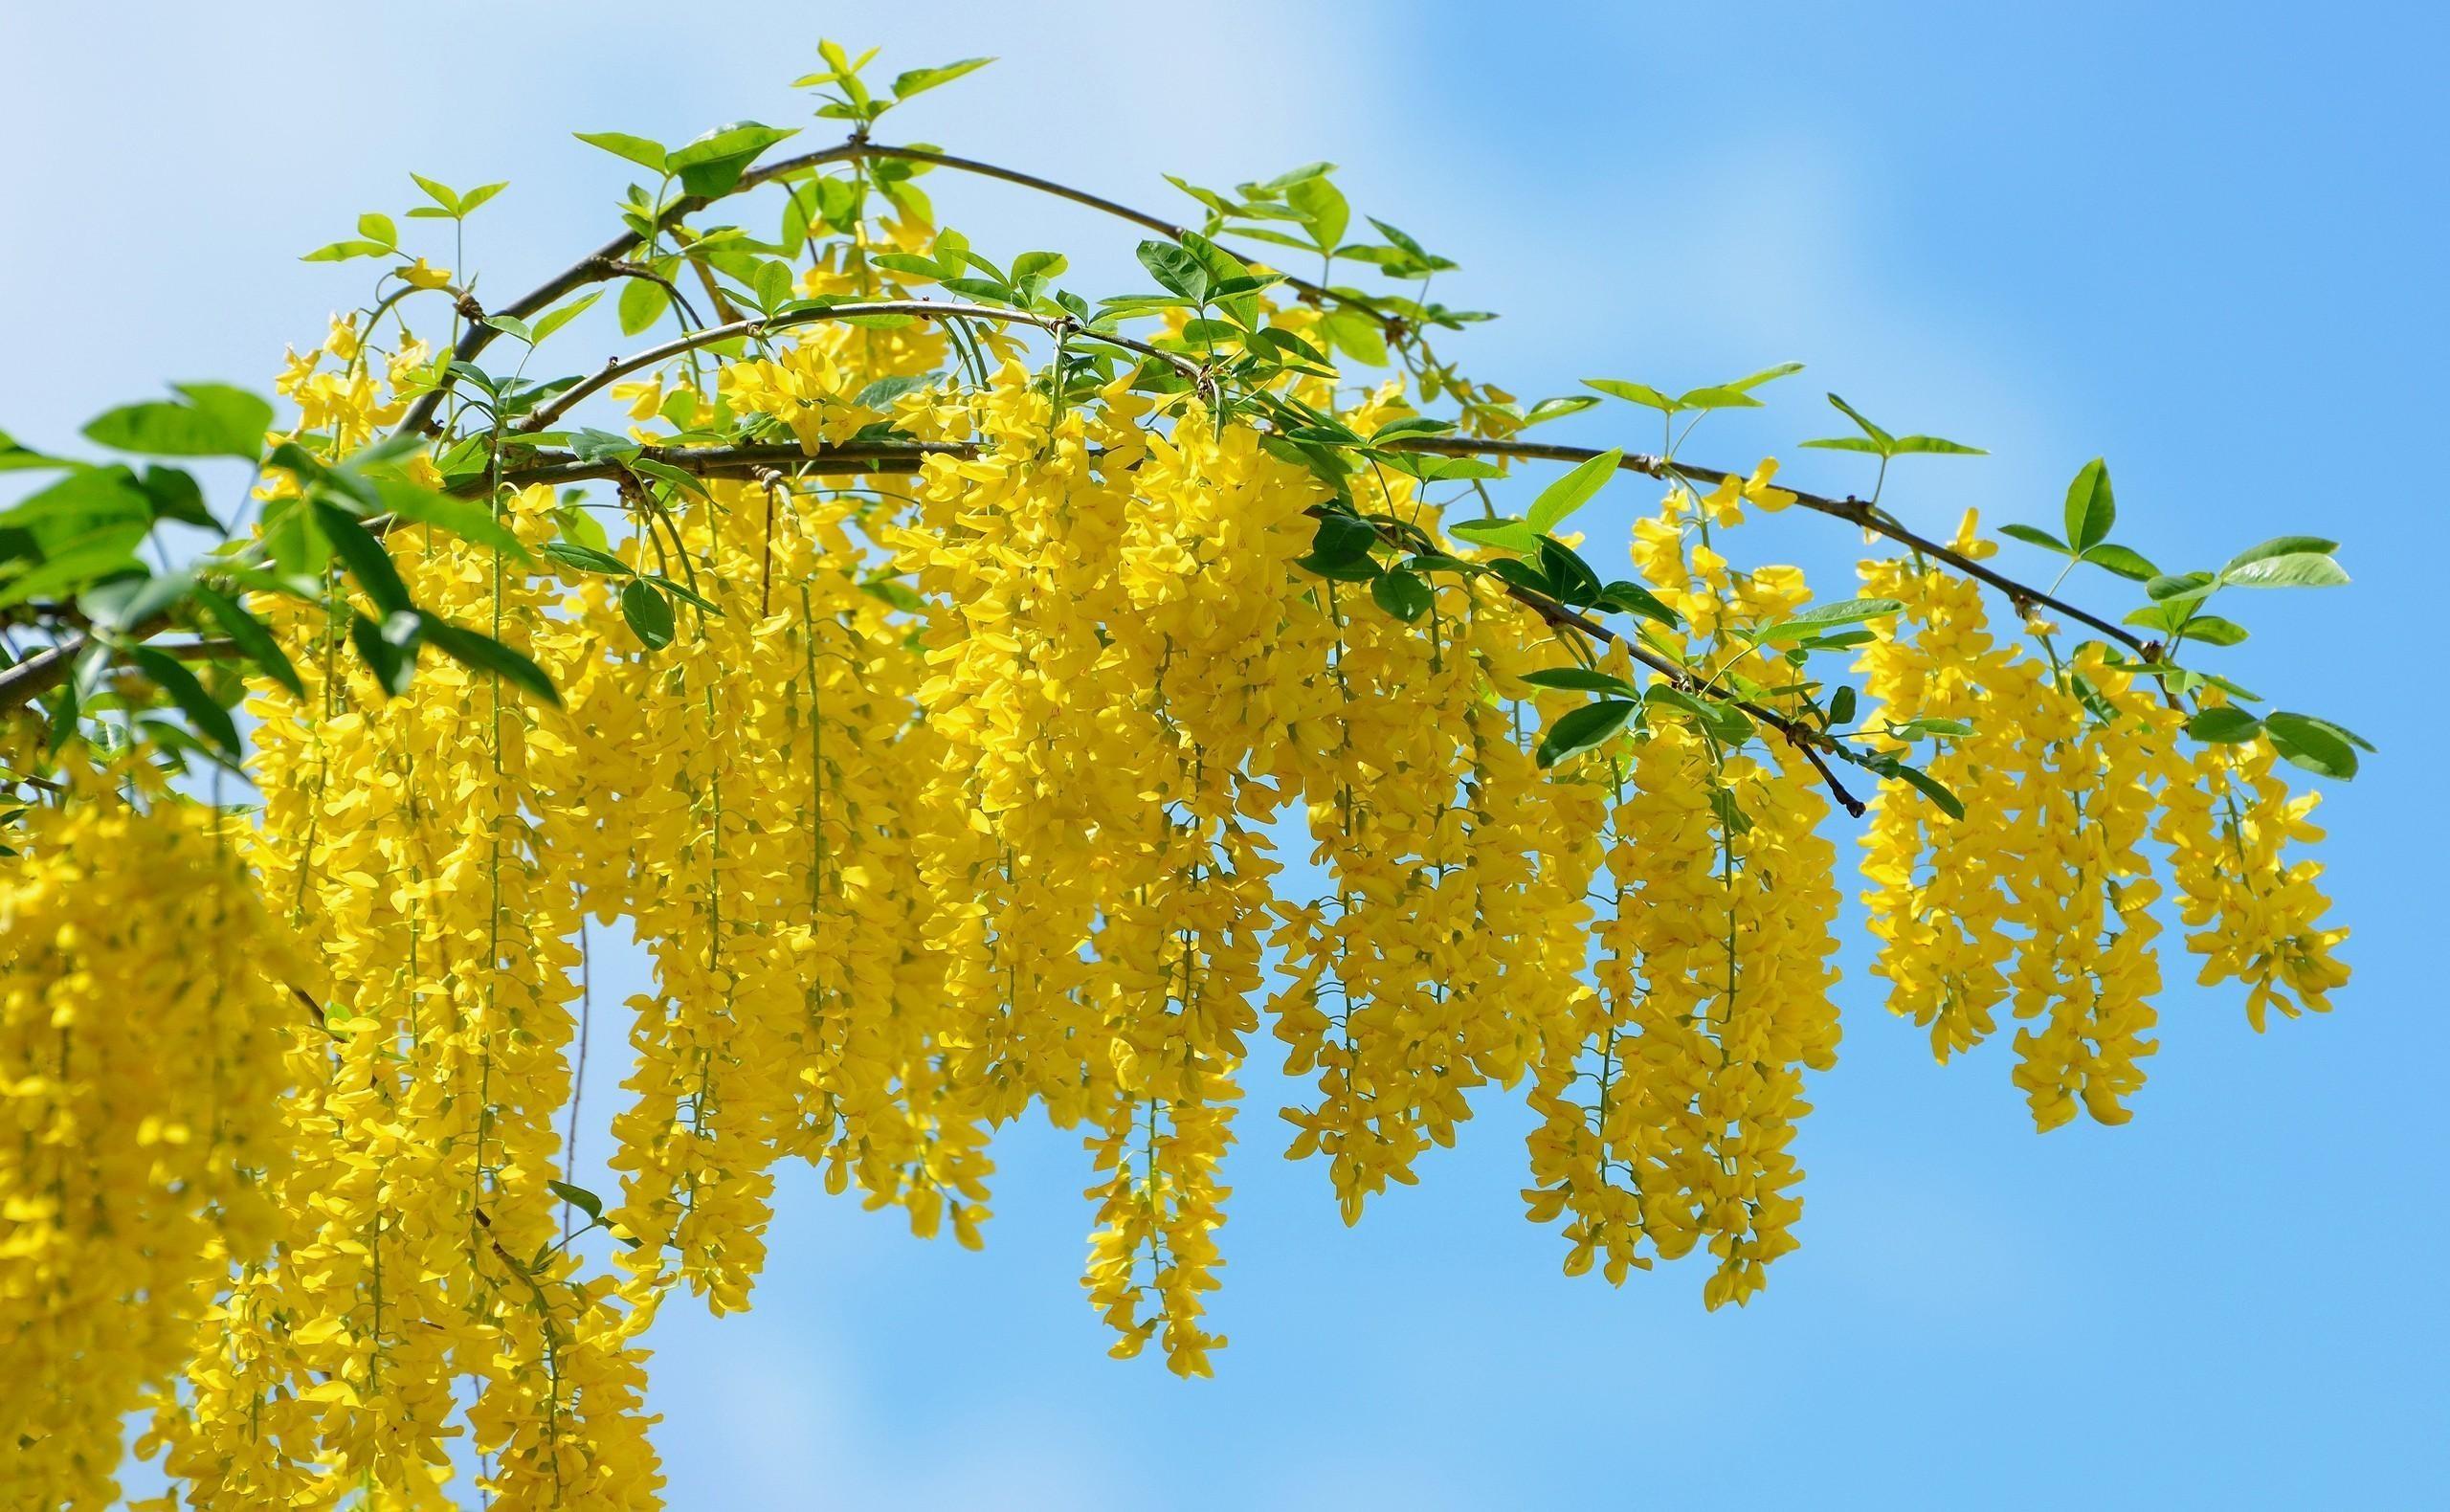 Wallpaper Sunlight Food Sky Branch Fruit Yellow Mimosa